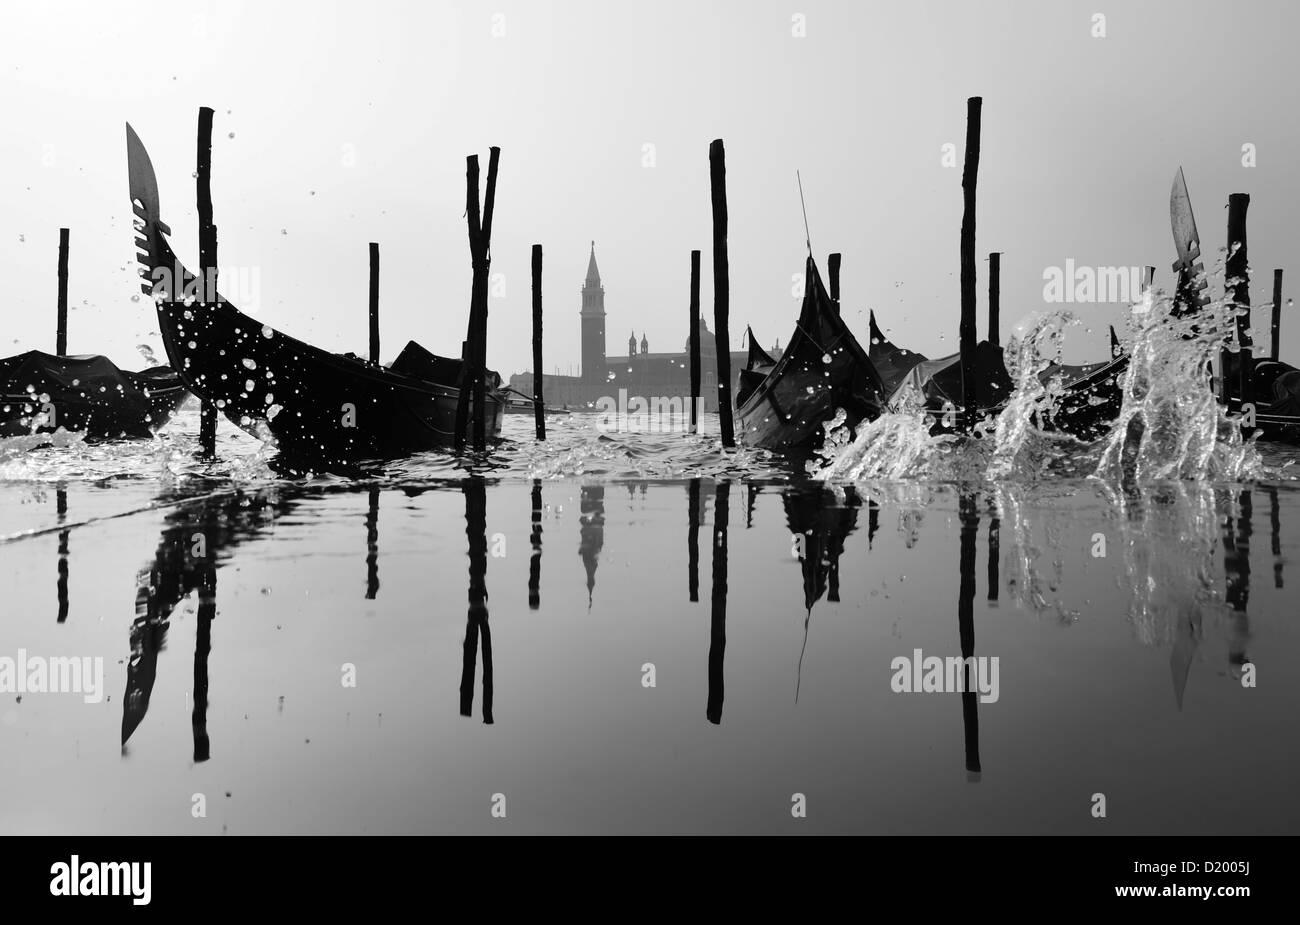 Las góndolas, agua pulverizada, San Giorgio Maggiore, Venecia, Italia Imagen De Stock